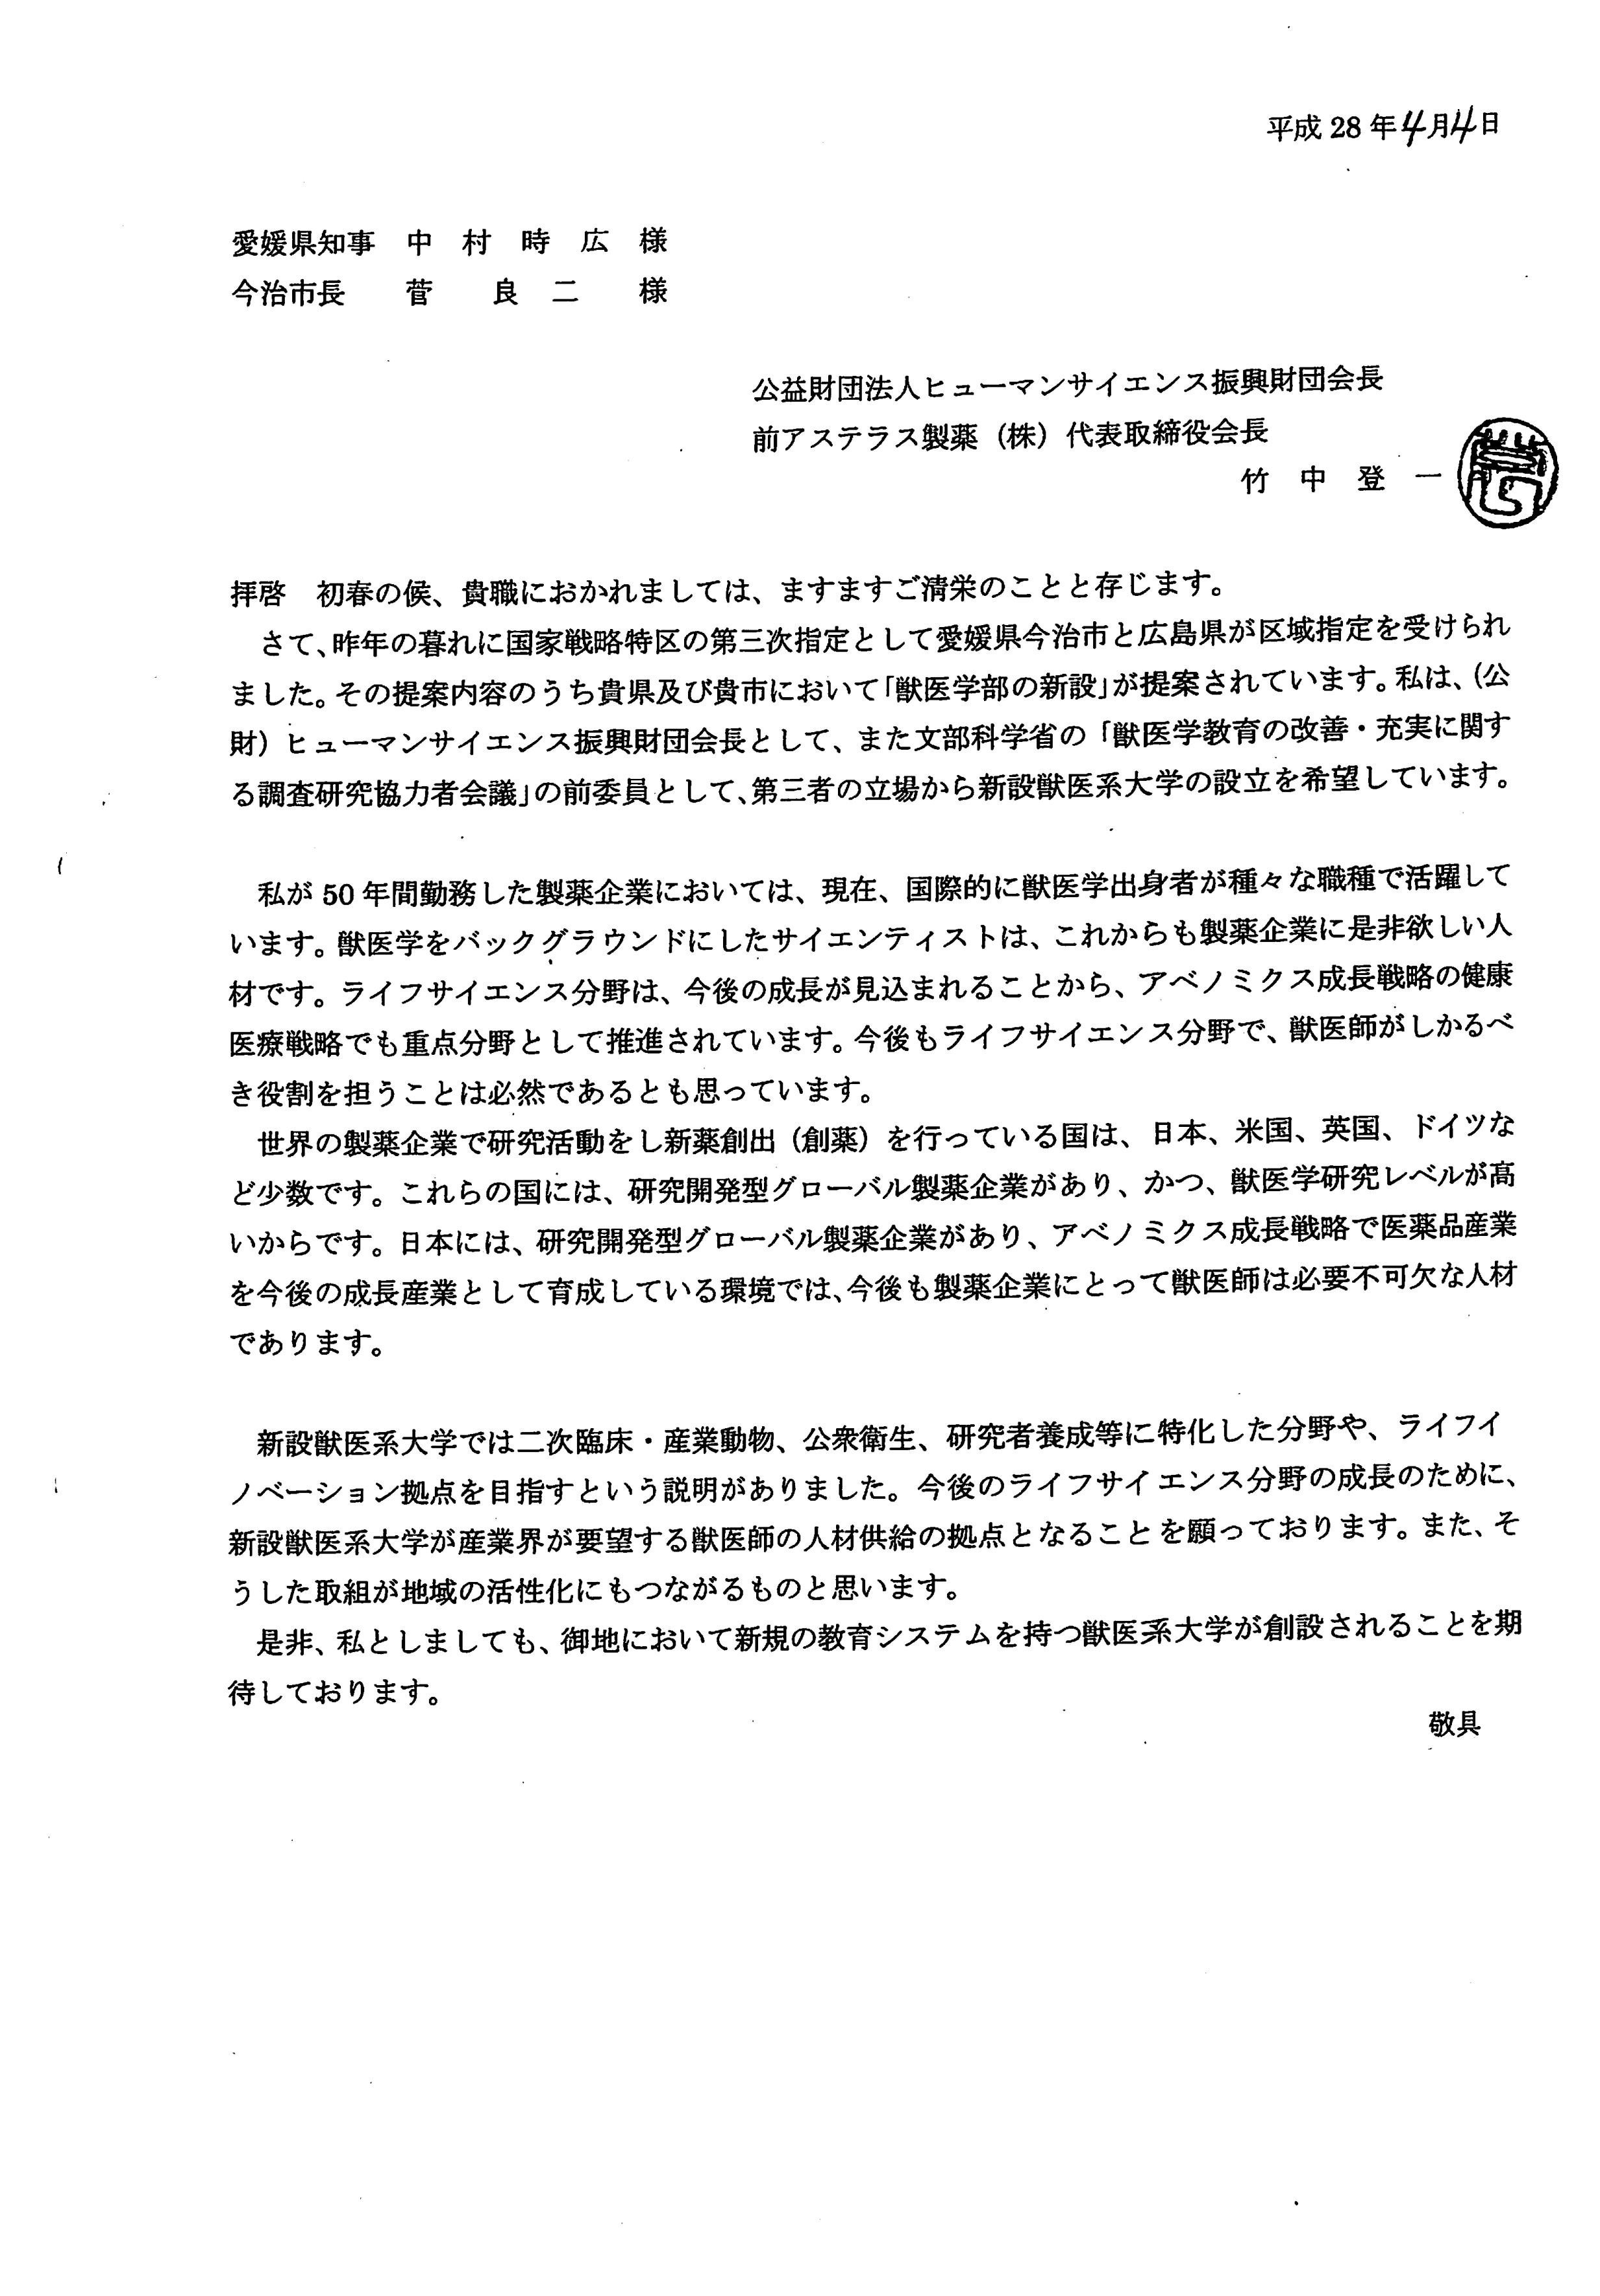 今治市 20160404東京出張 国家戦略特区(大学獣医学部の誘致等)に関する協議 (6)